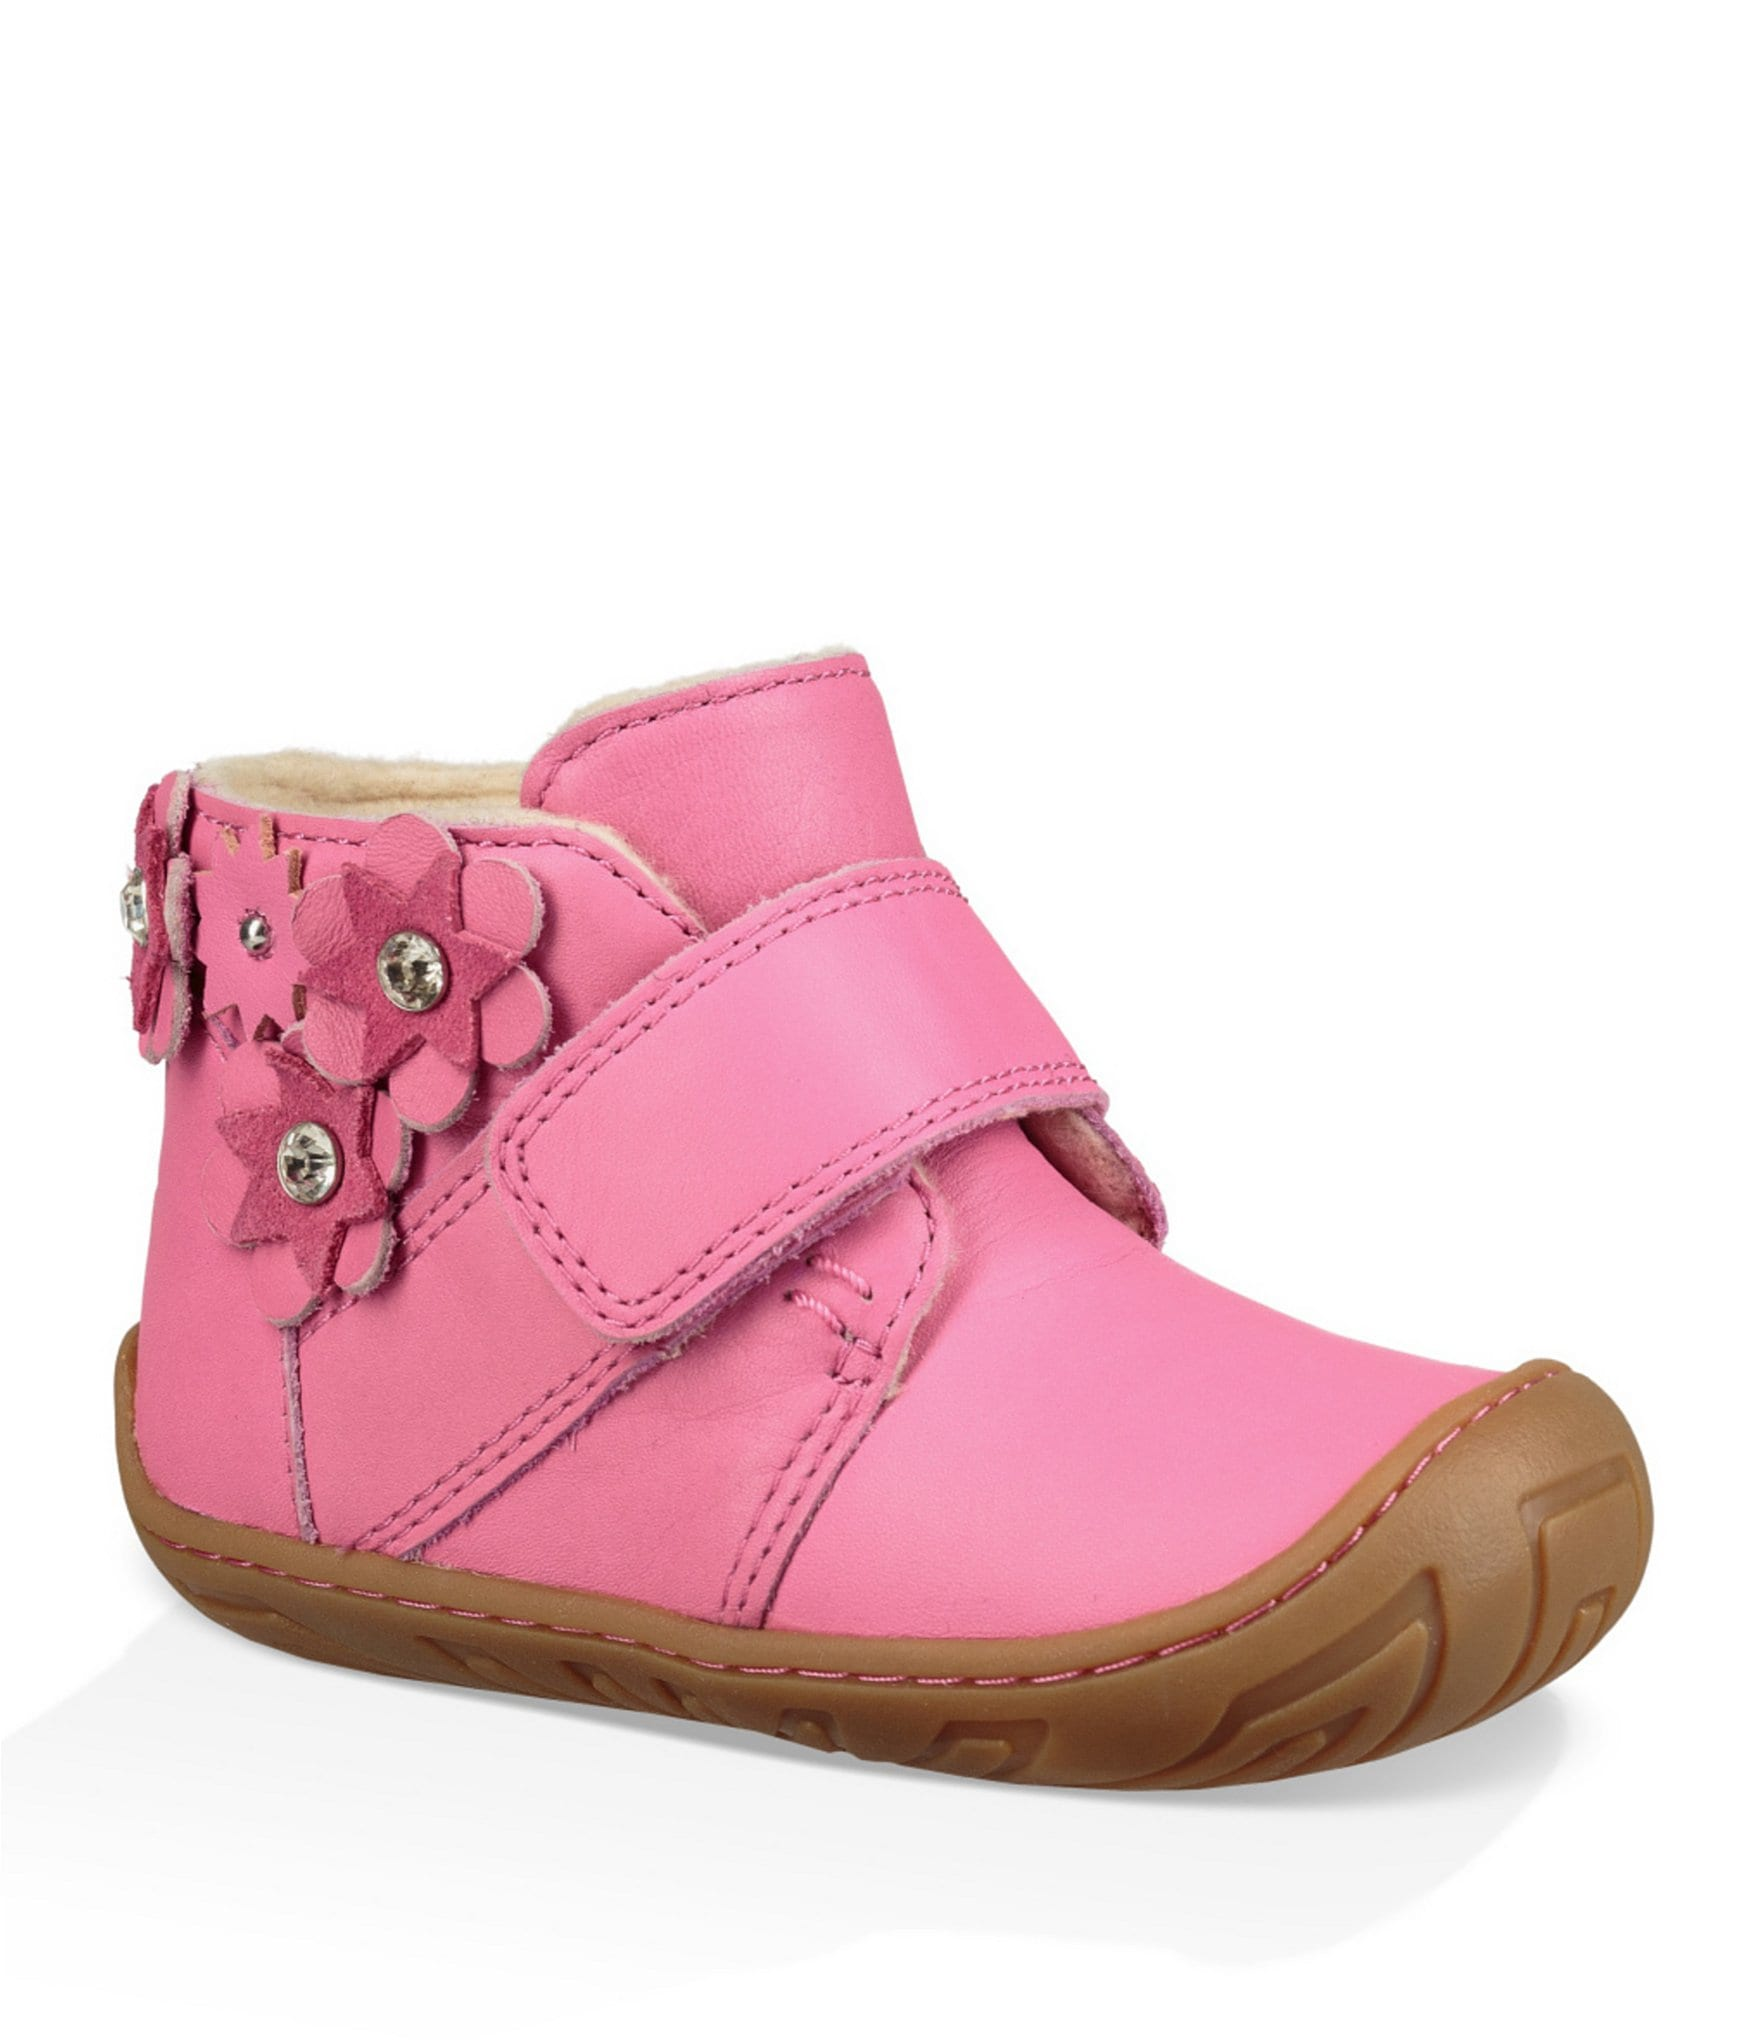 Azalea Brand Shoes